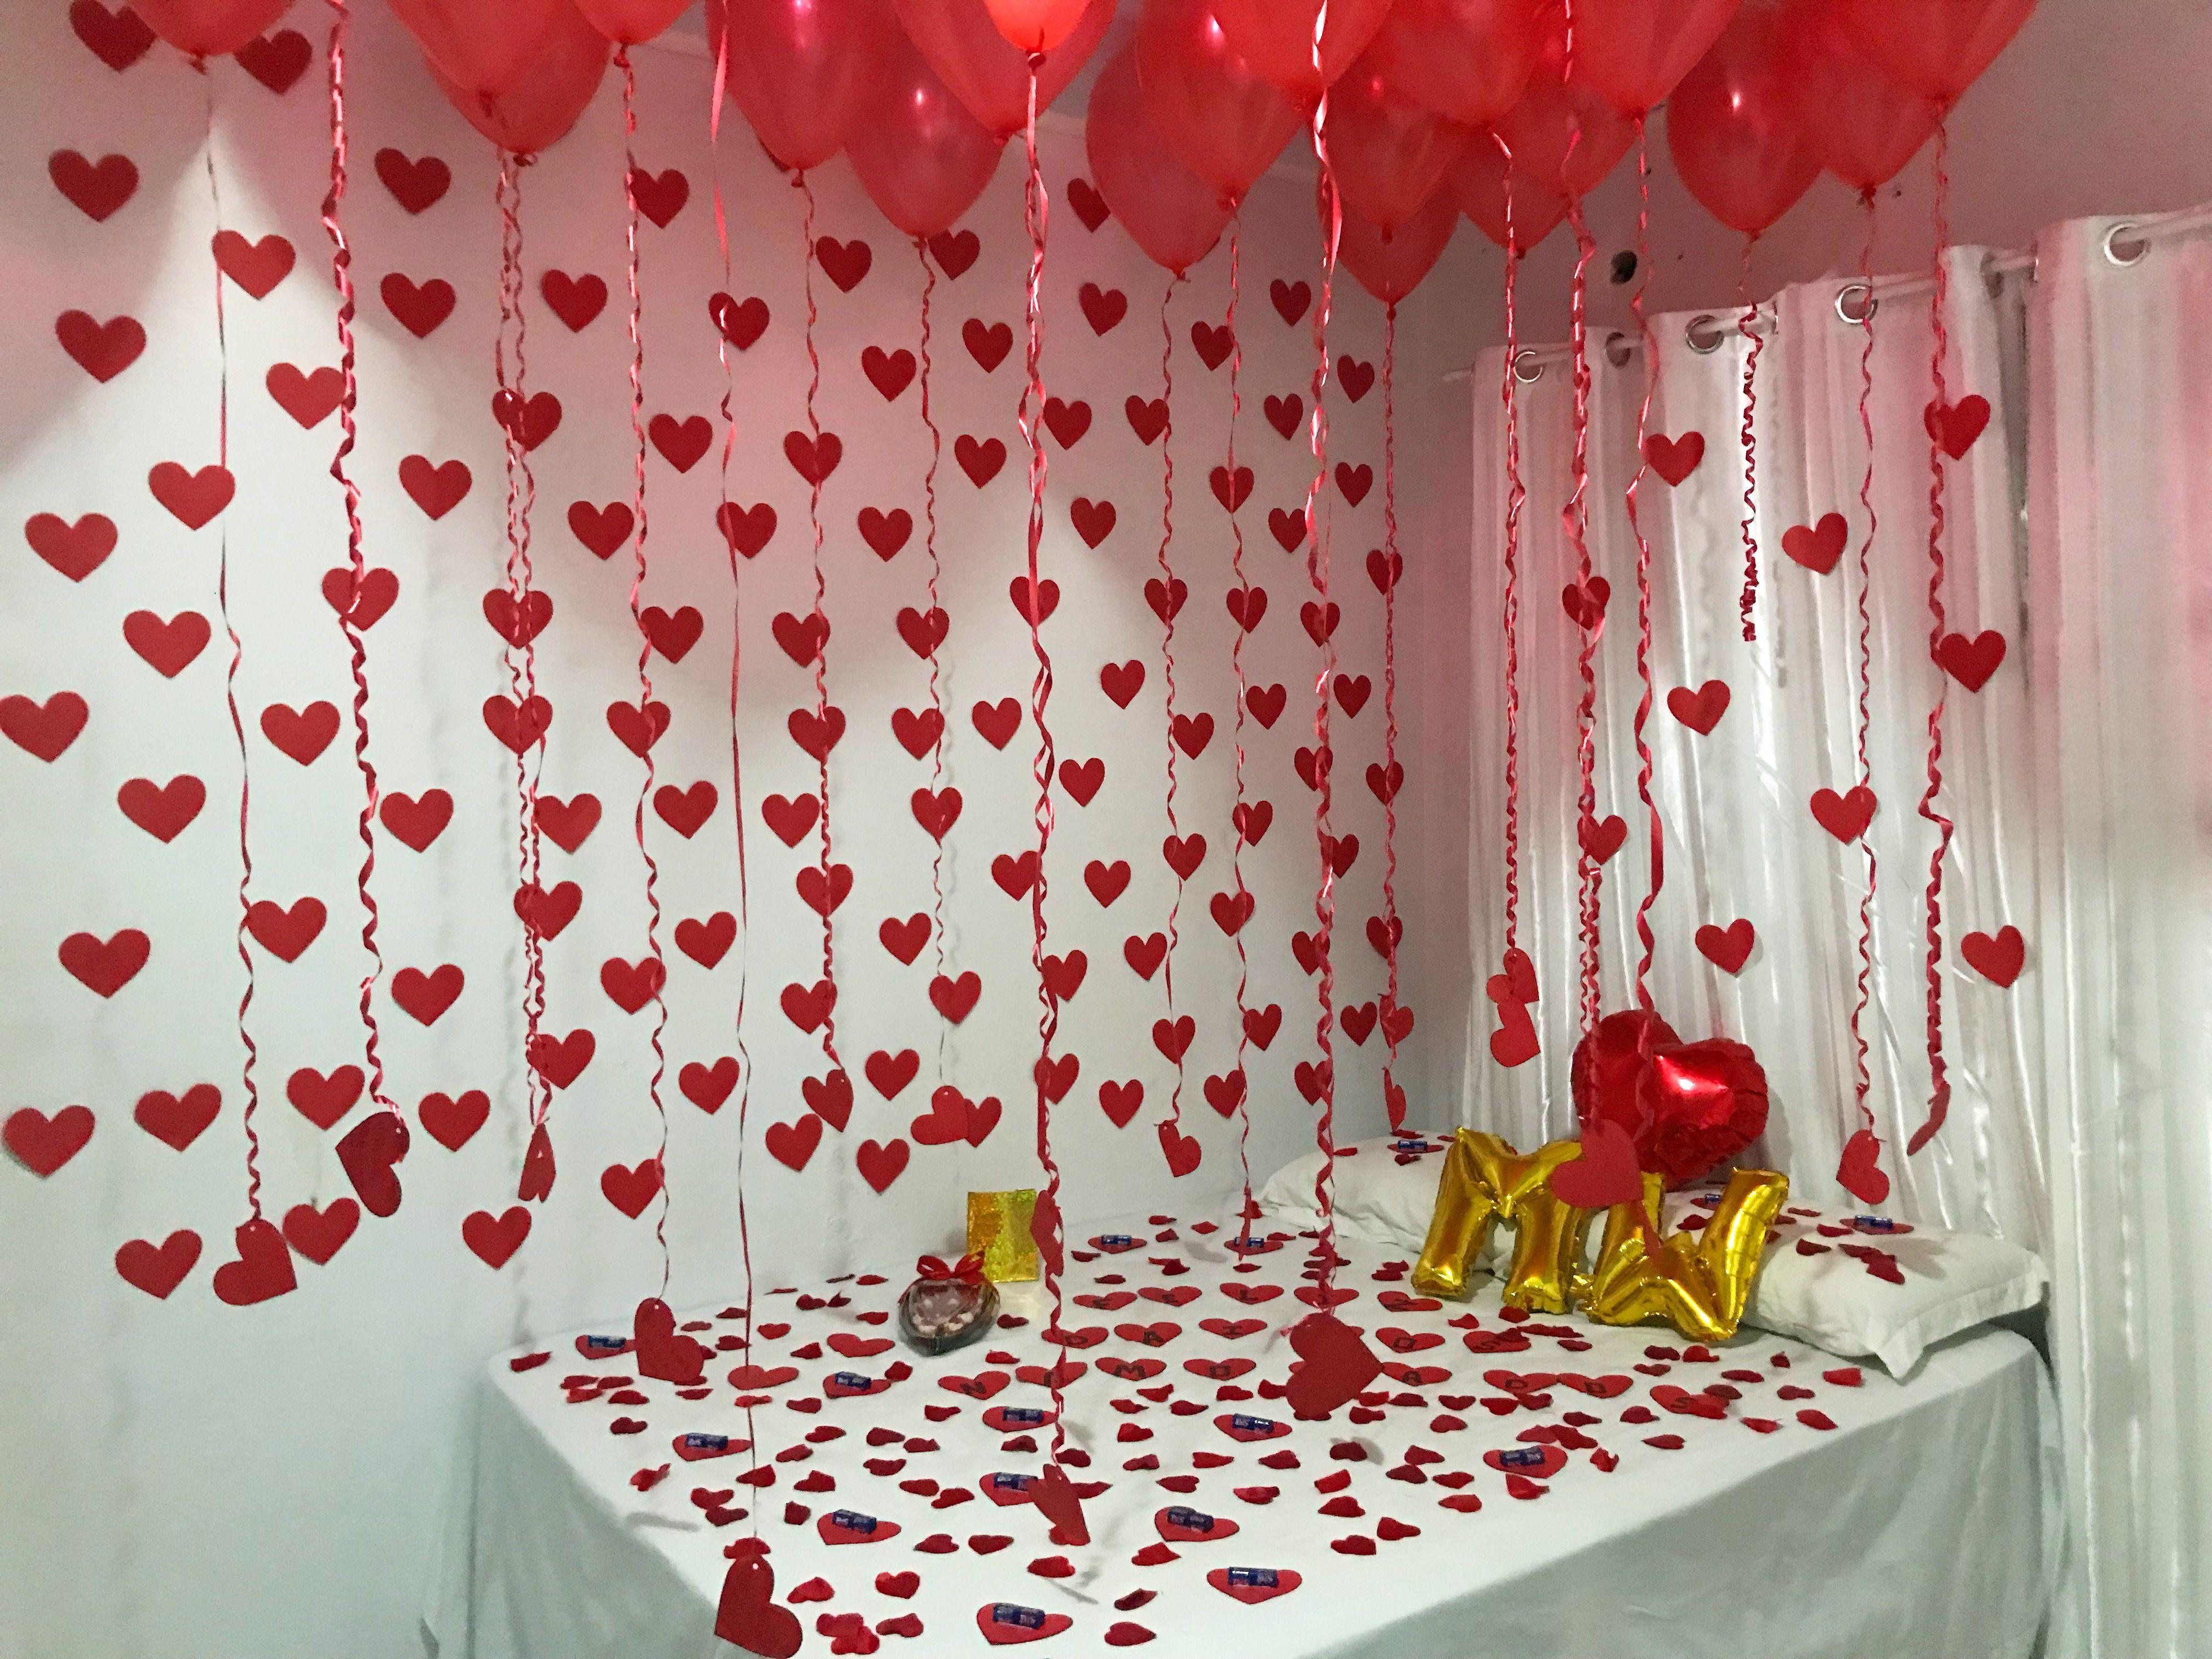 Pin De Alinneadrieliluciani Em Surpresa Romantica Para Namorado Em